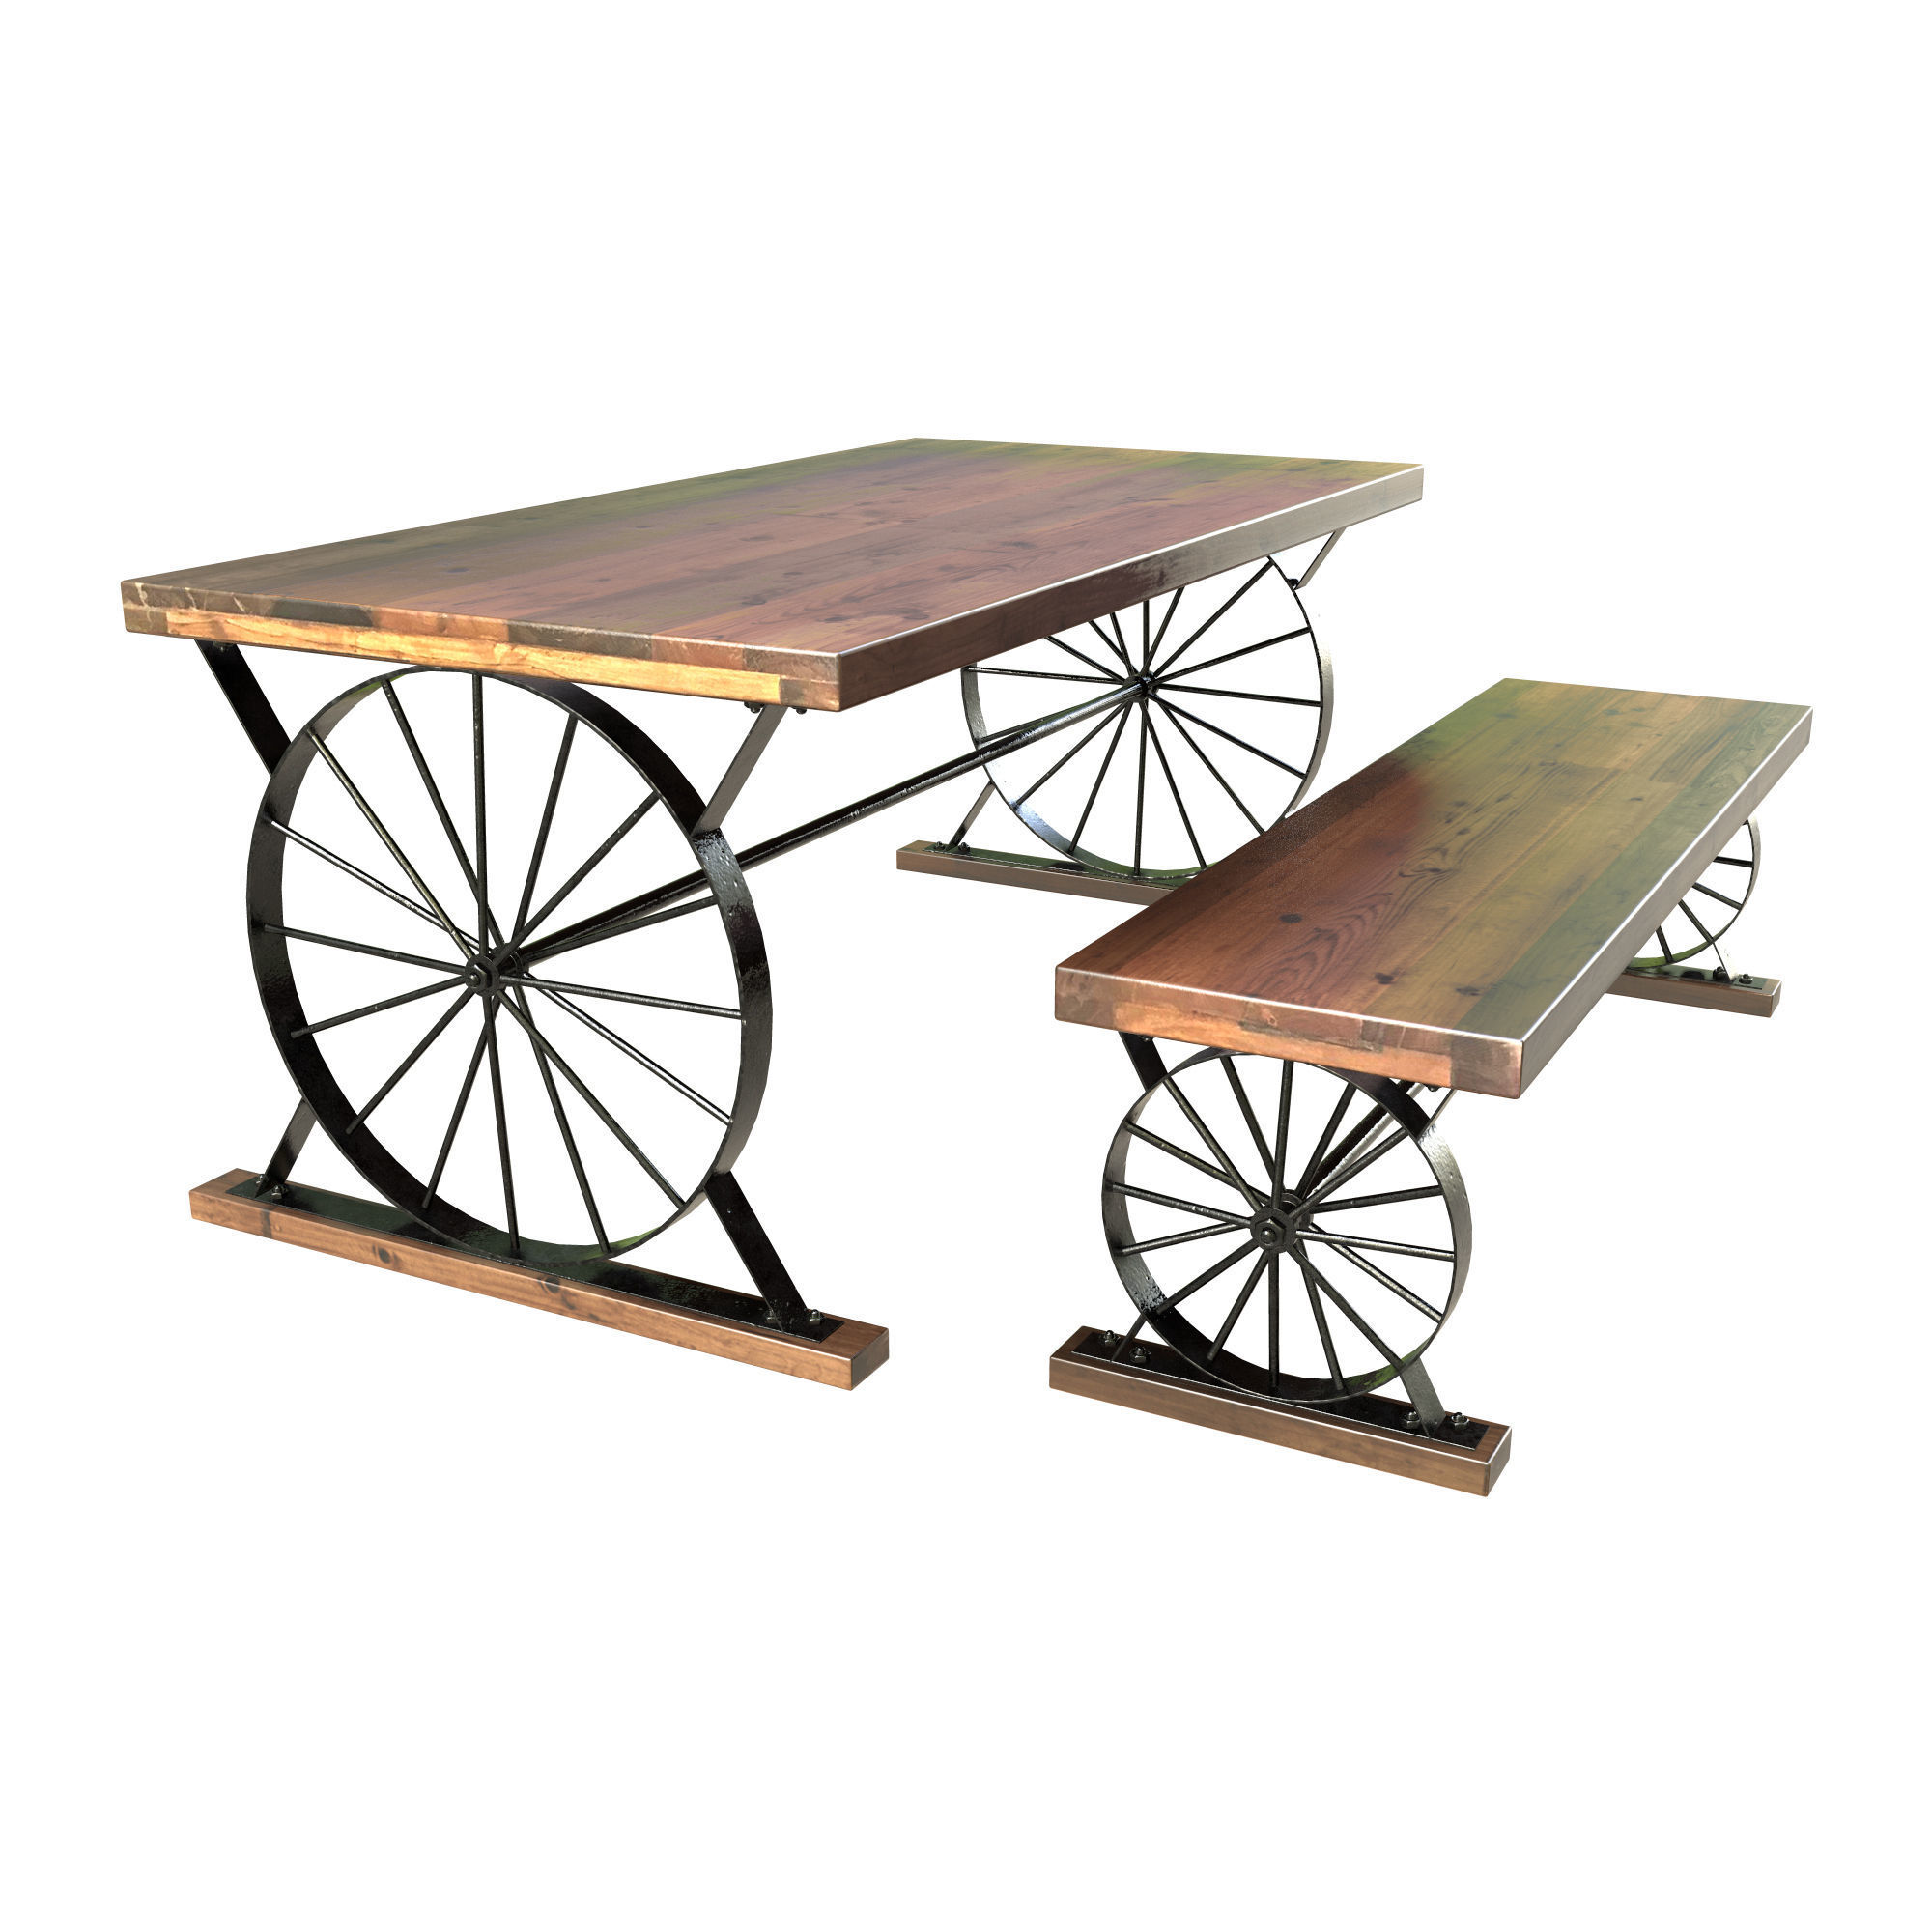 Wagon Wheel Dining Table Bench